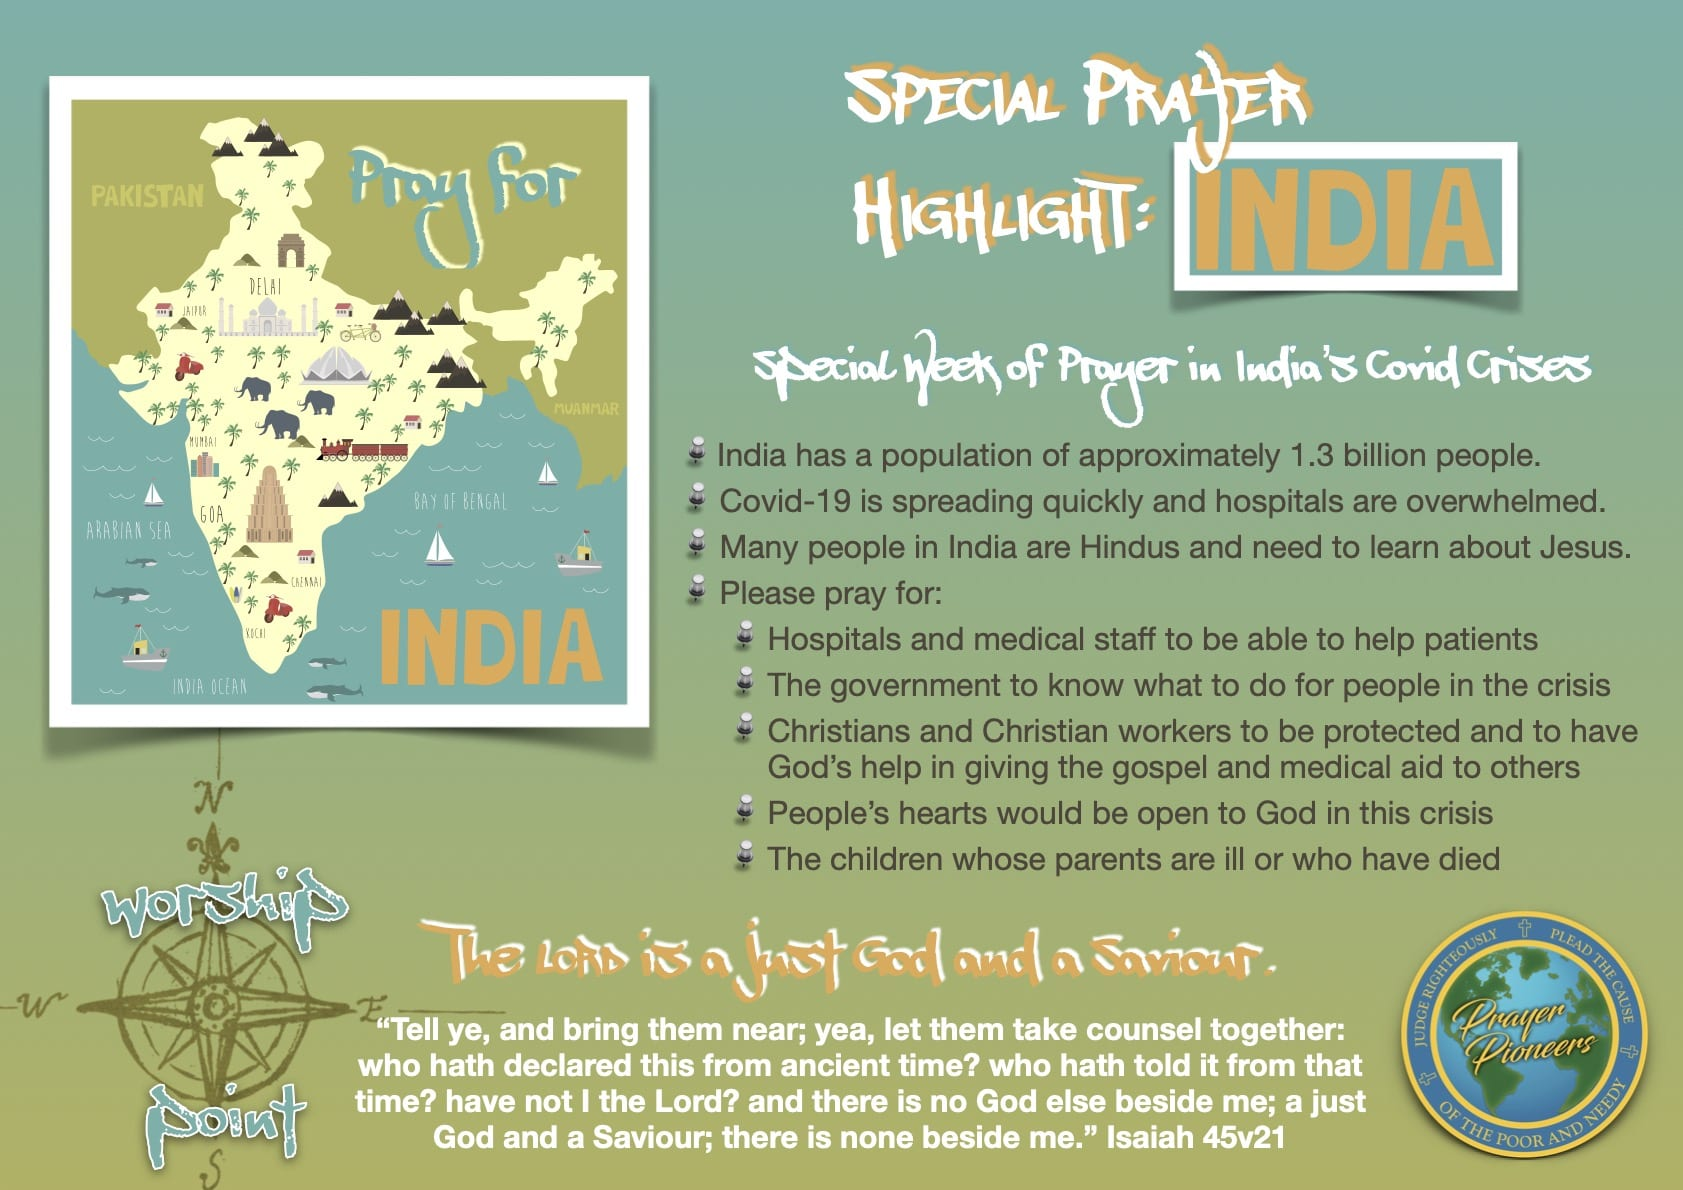 India Highlight